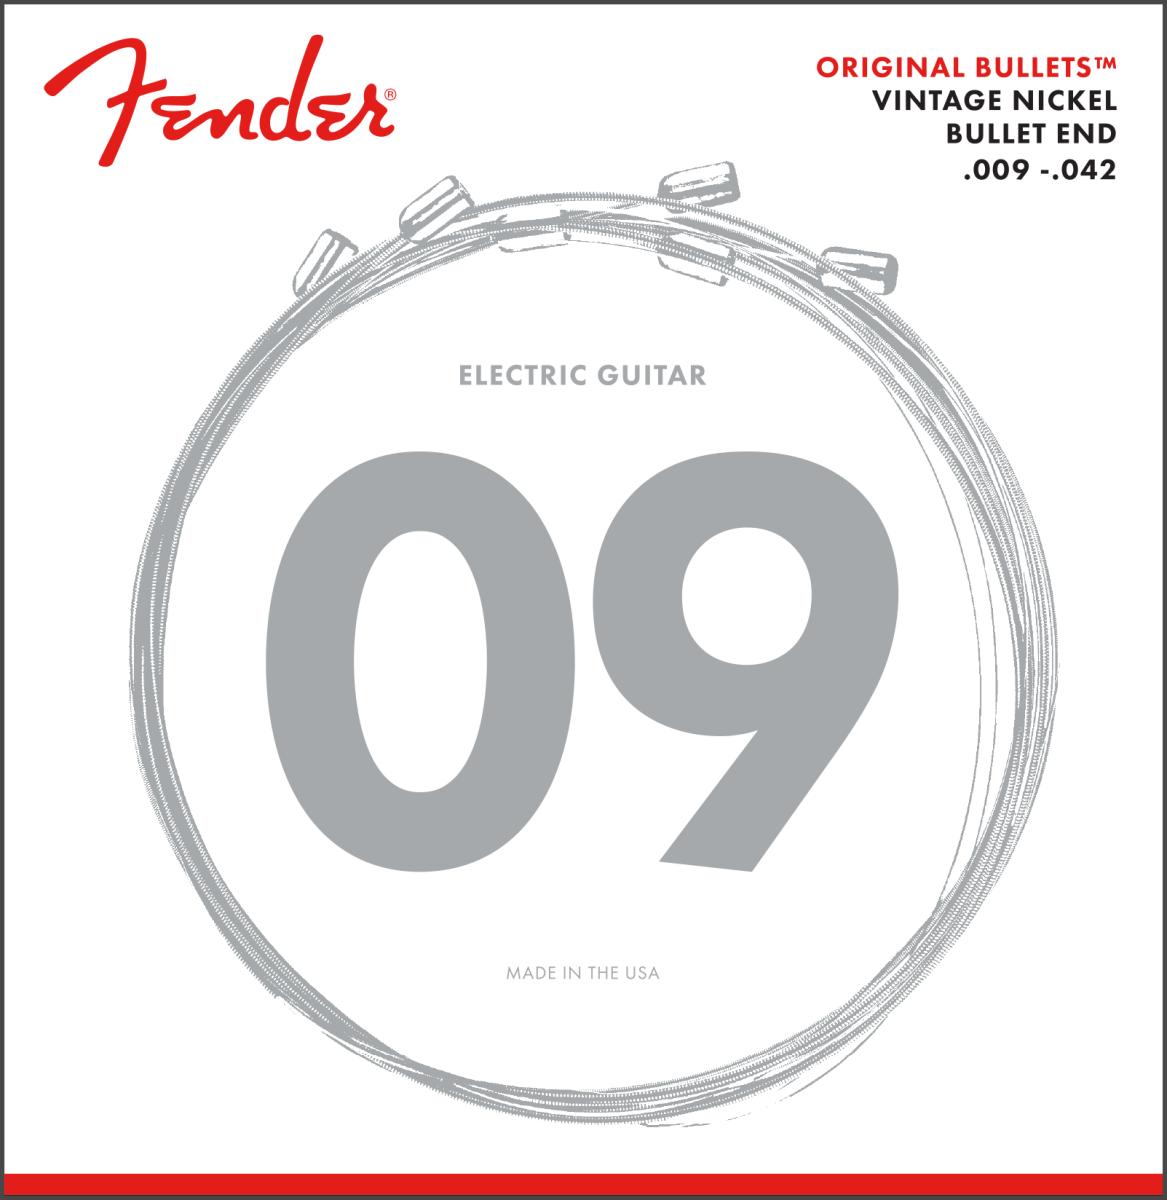 Fender 3150 Original Bullets - Pure Nickel Electric Guitar Strings